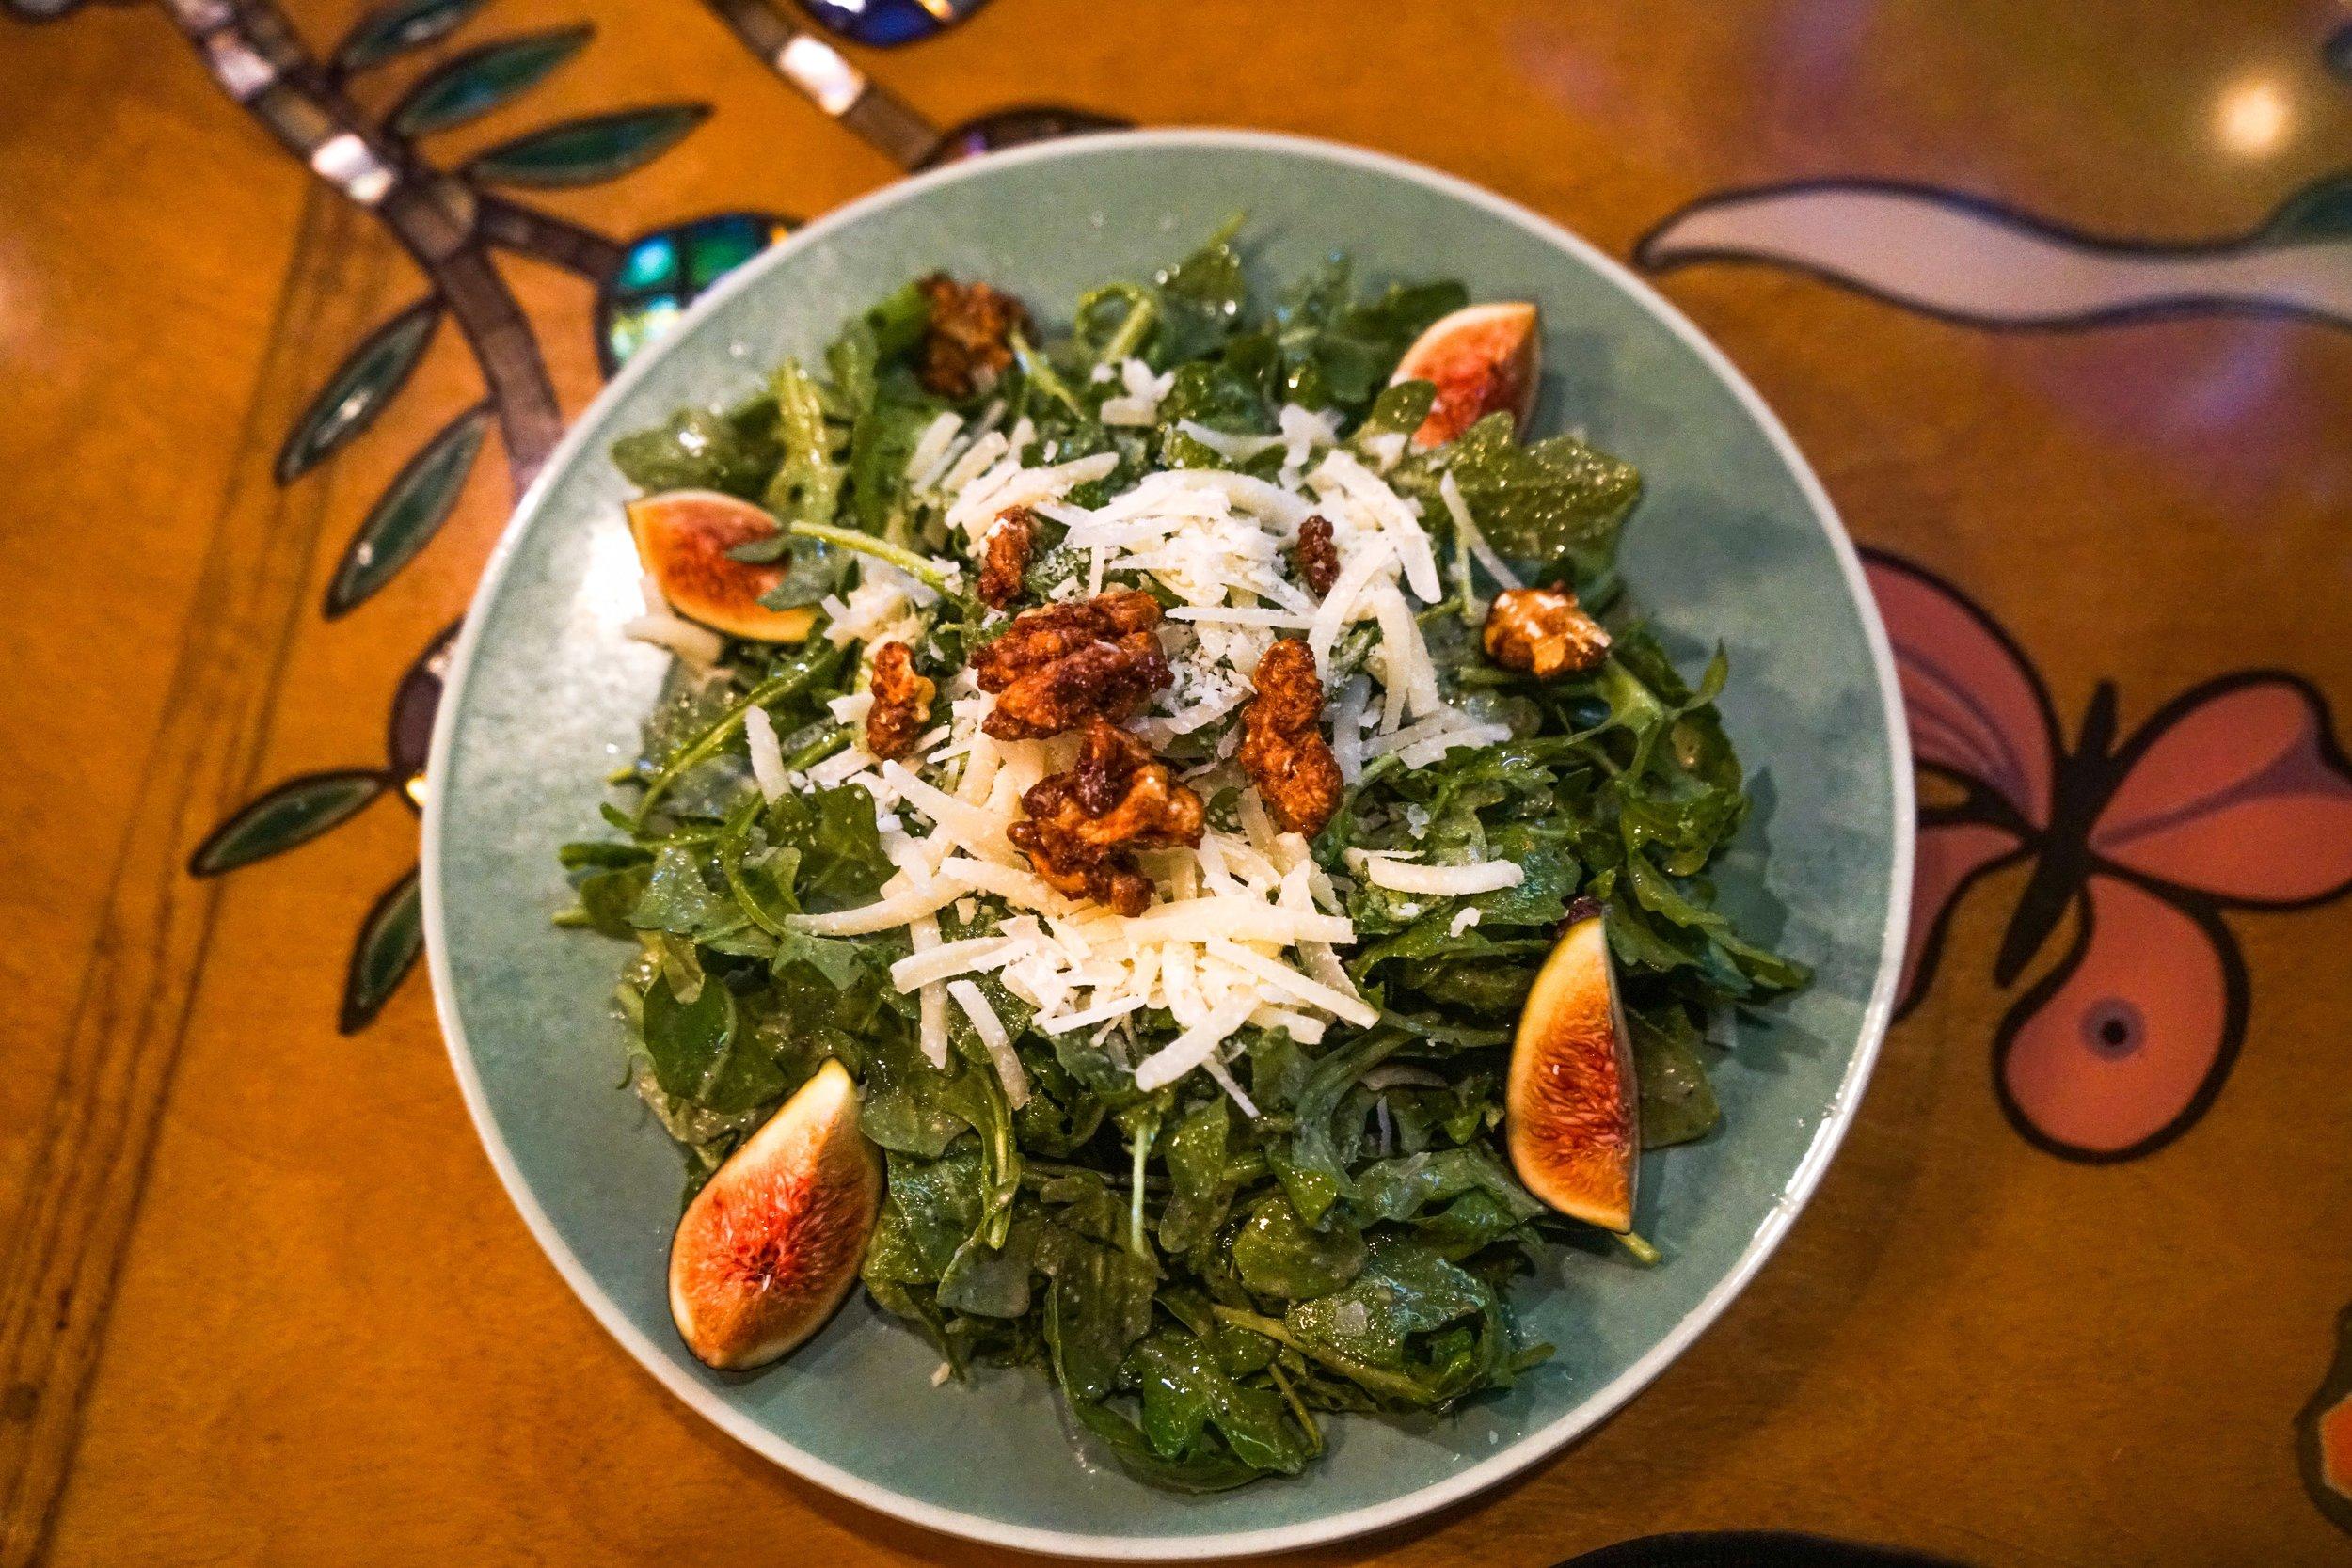 Feature Salad: Arugula Salad with Fresh Figs, Candied Citrus Walnuts, and Pecorino in a Walnut Vinaigrette